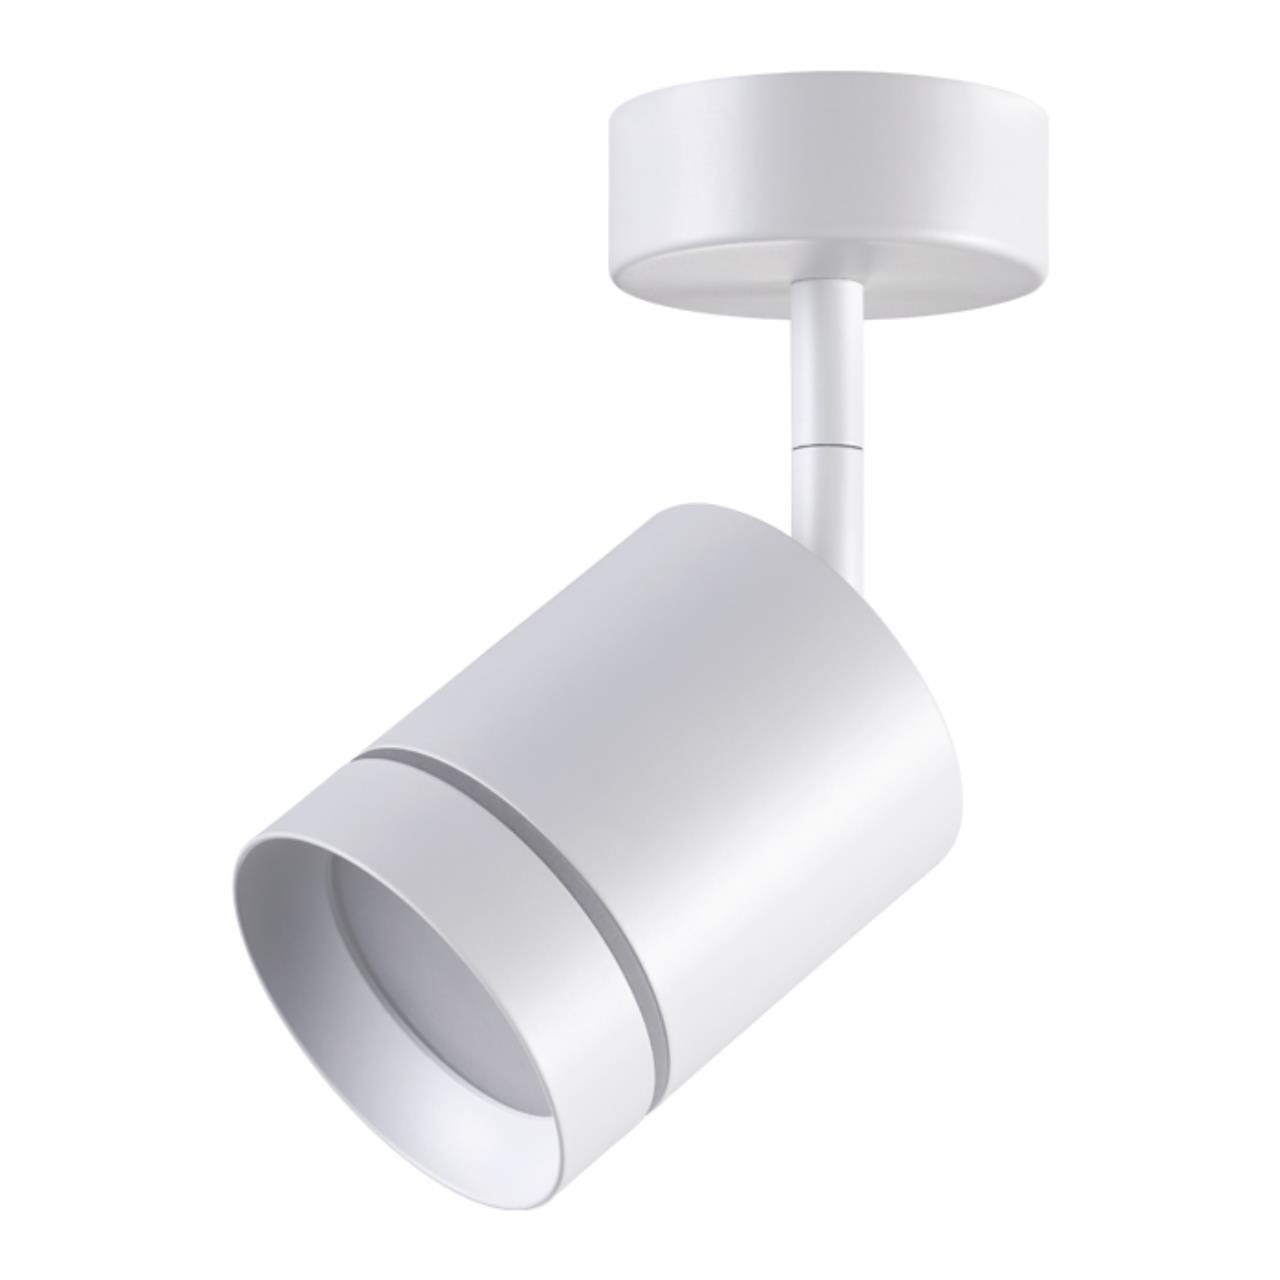 358259 OVER NT19 071 белый Накладной светильник IP20 LED 9W 160-265V ARUM